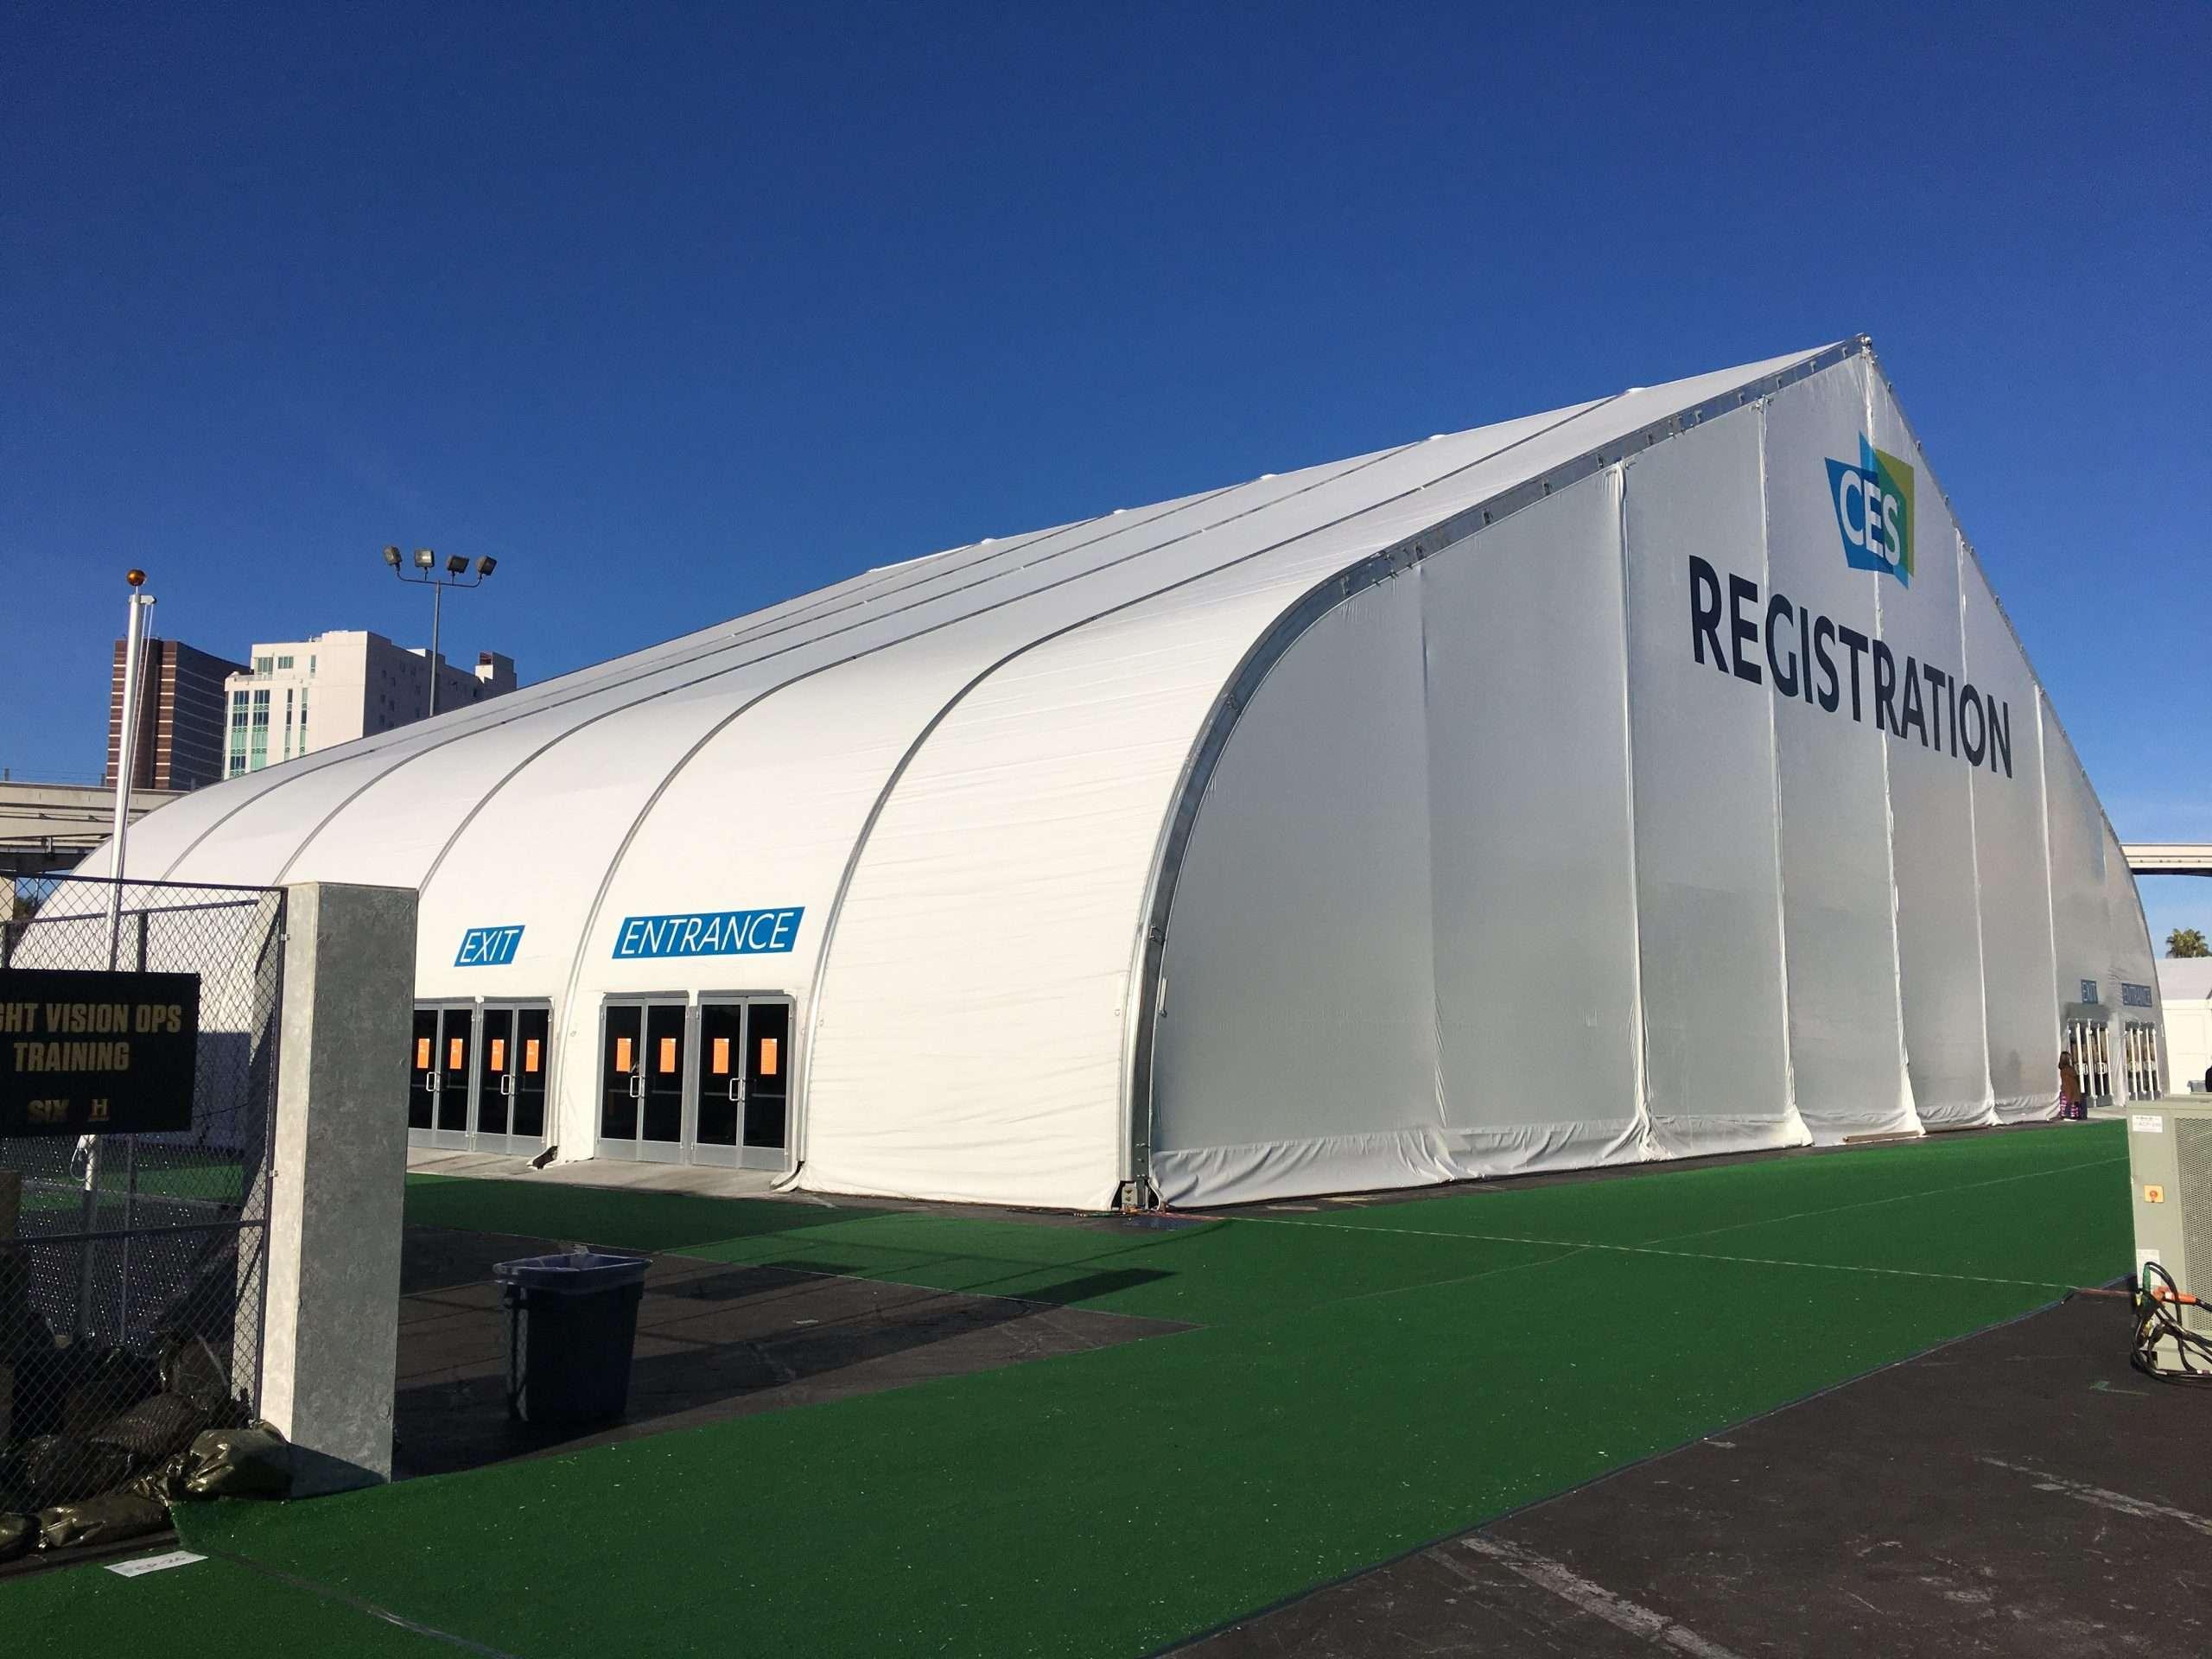 CES Registration area including public entrance doors on Allsite TFS temporary structure